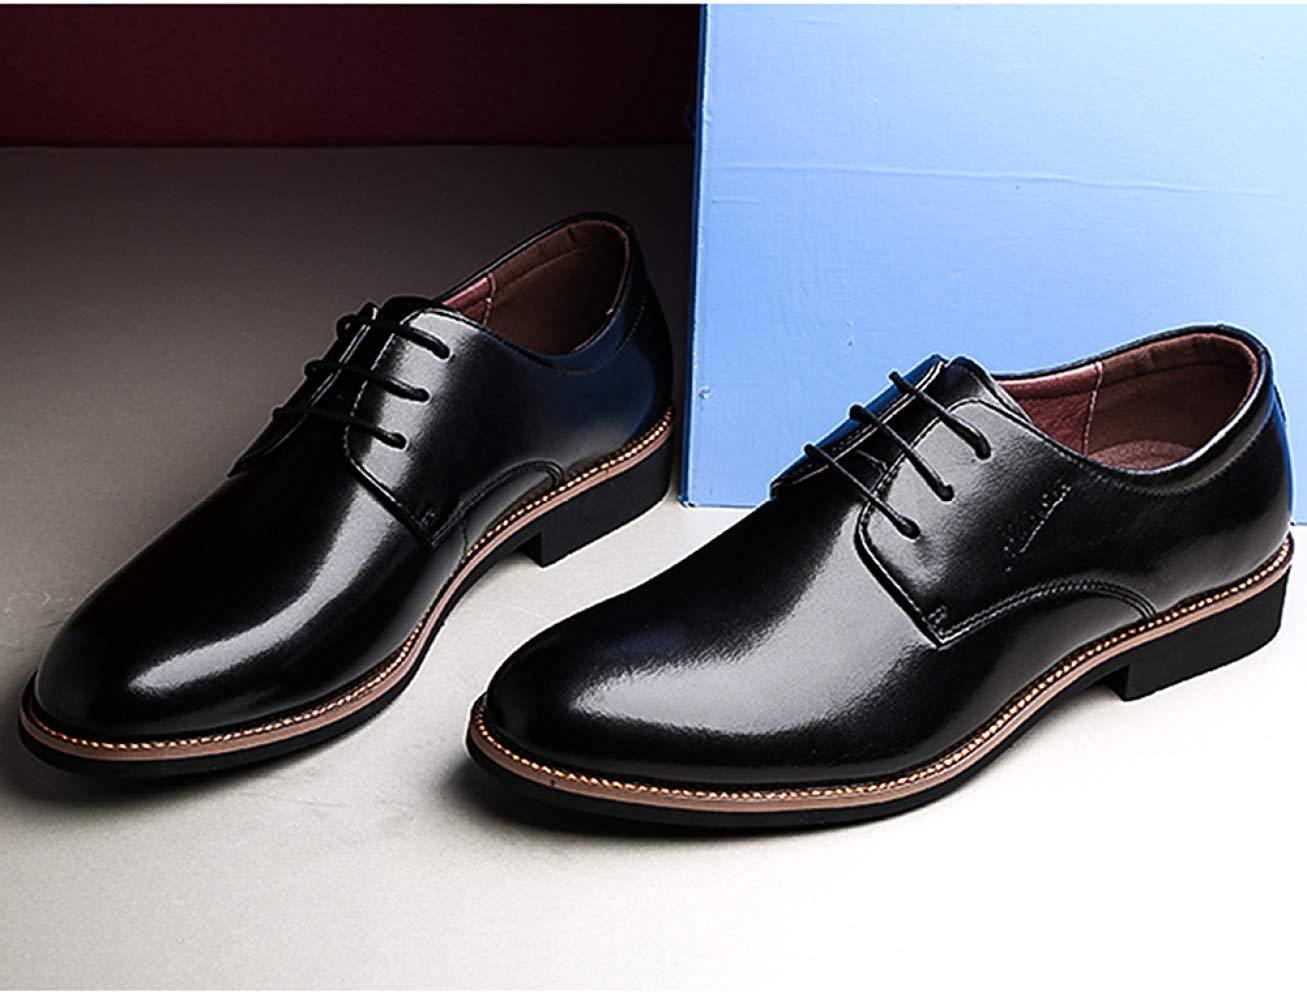 HhGold Männer Schnüren Sich Oben Oxford-Schuhe Oxford-Schuhe Oxford-Schuhe Business Casual Schuhe Tooling Schuhe (Farbe   Schwarz, Größe   38EU) 12085e